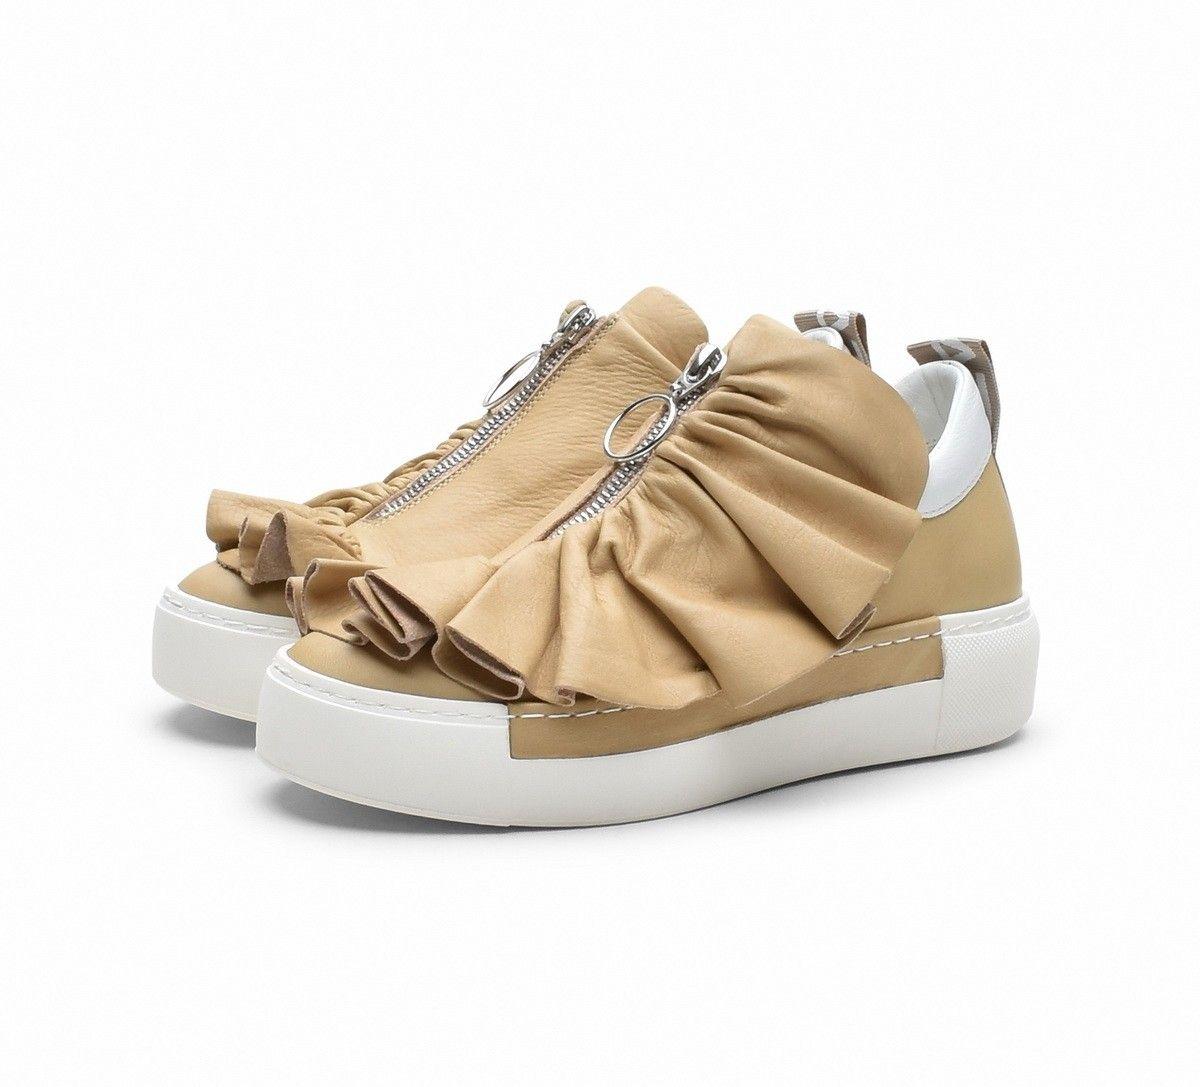 VIC MATIE - Damen Sneaker - Scarpa Velvet - Gomma